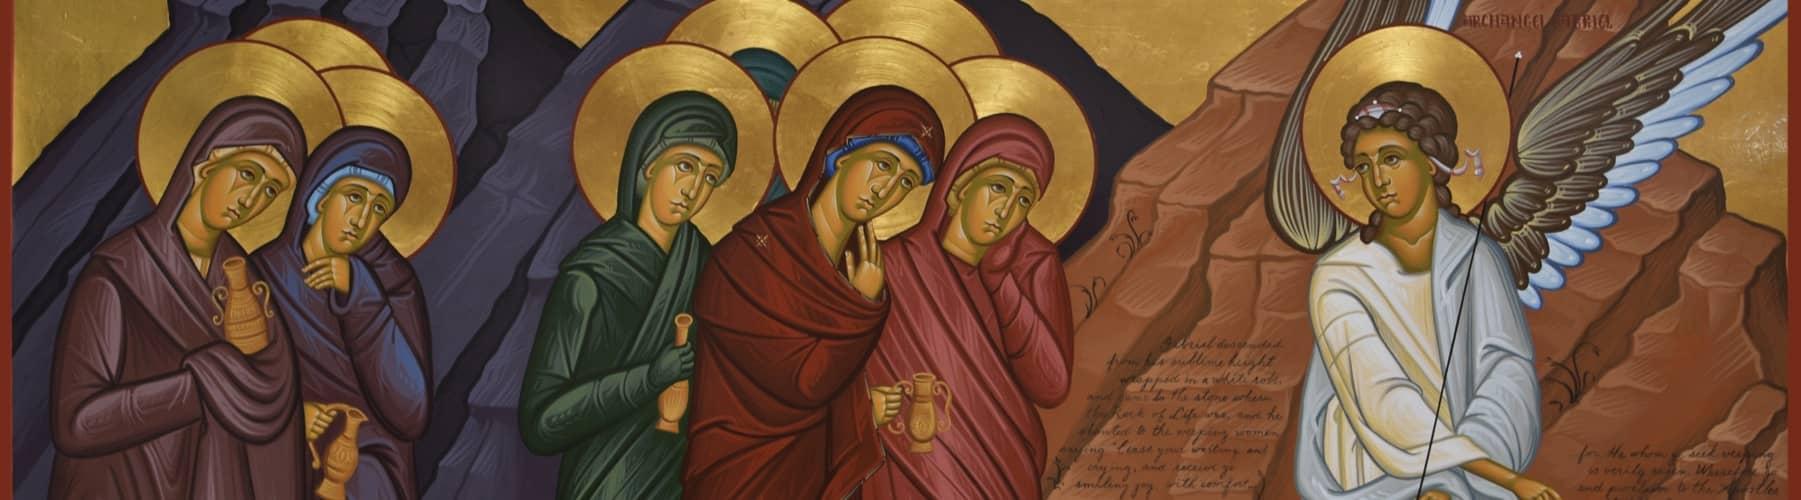 Myrrh Bearers at the Empty Tomb